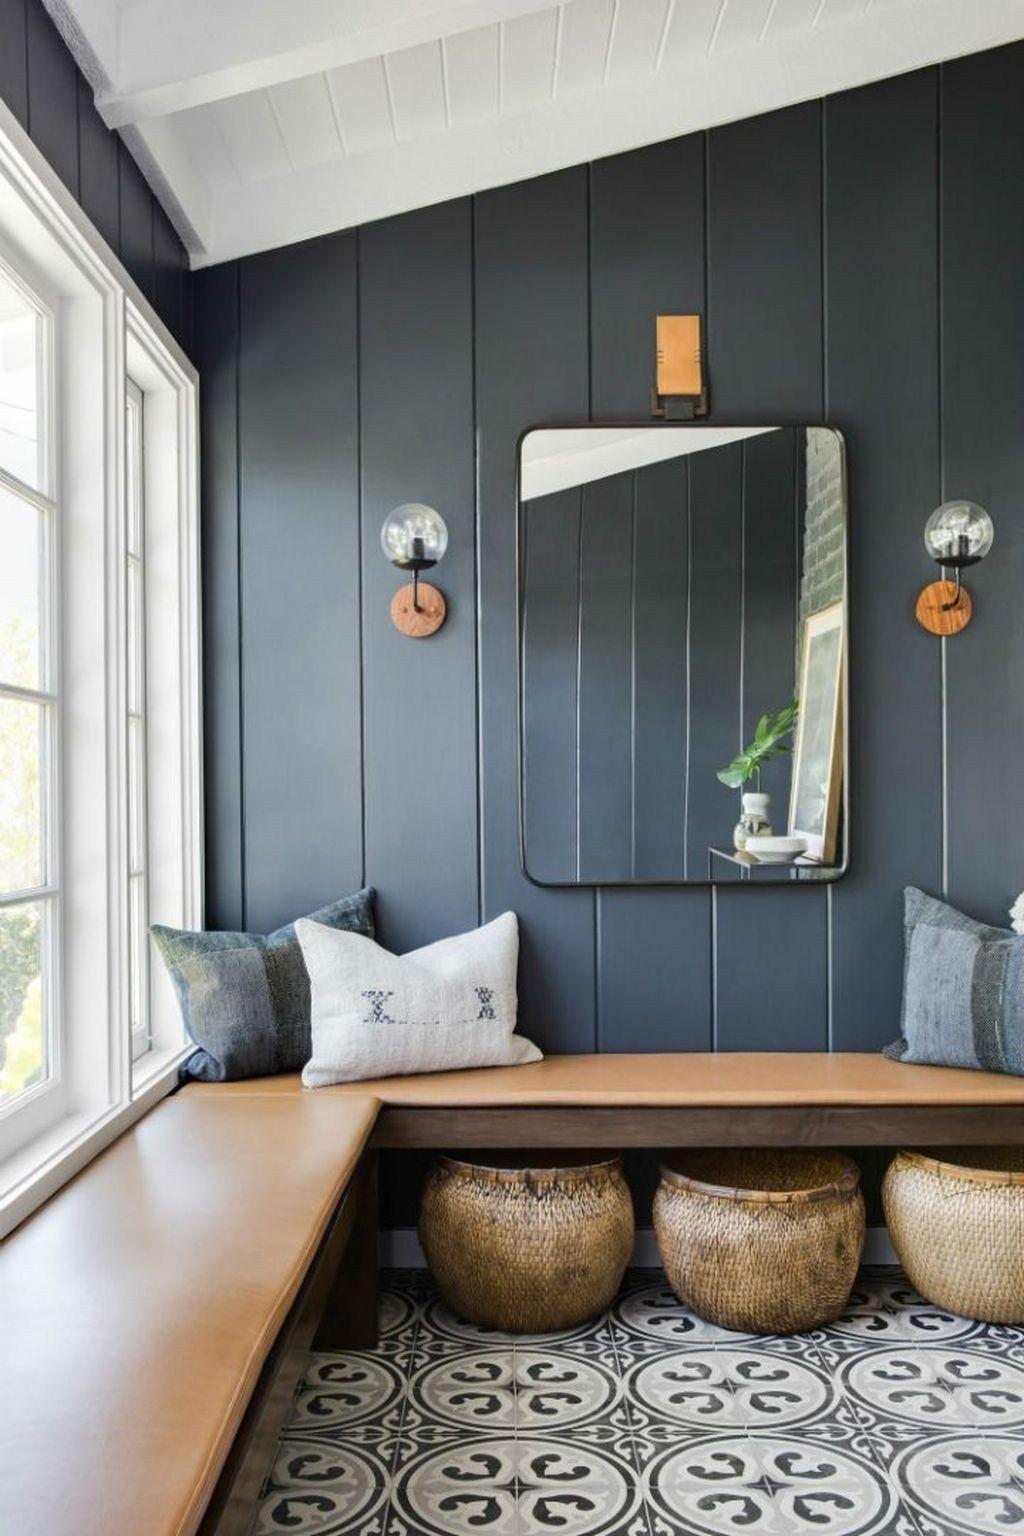 Elegant Home That Abounds With Beach House Decor Ideas: 42 Popular Interior Design Ideas With Farmhouse Style